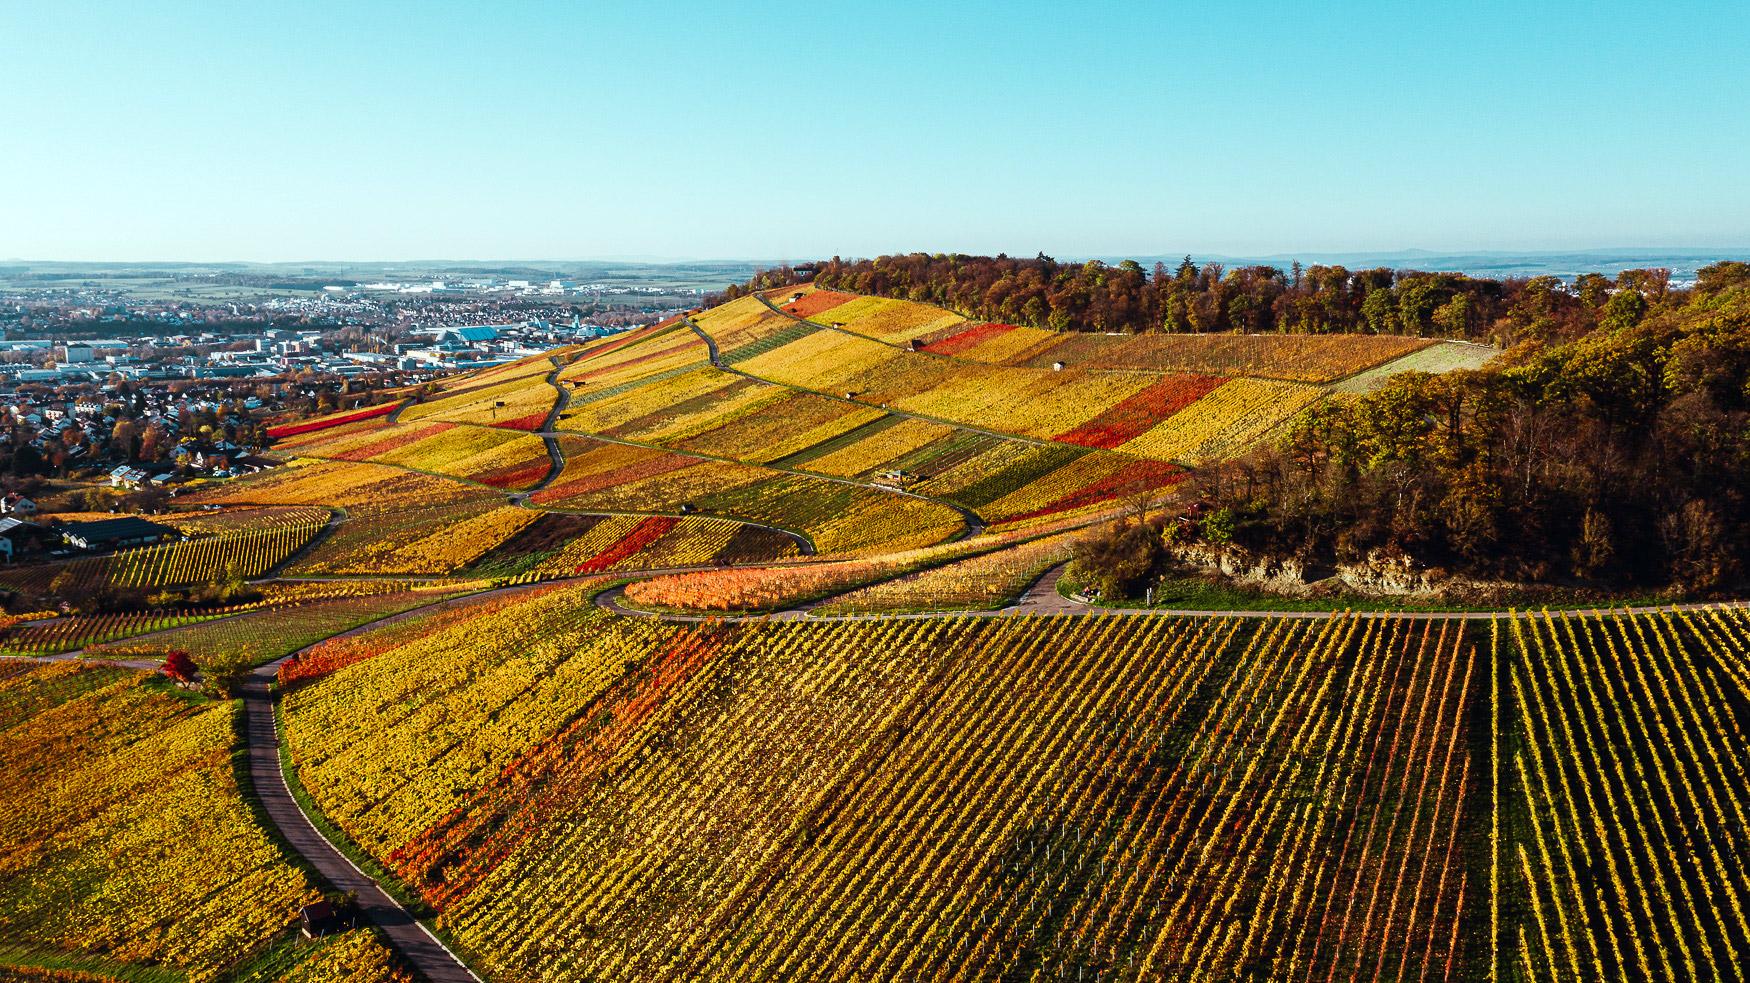 Weinberge Heilbronn Herbst